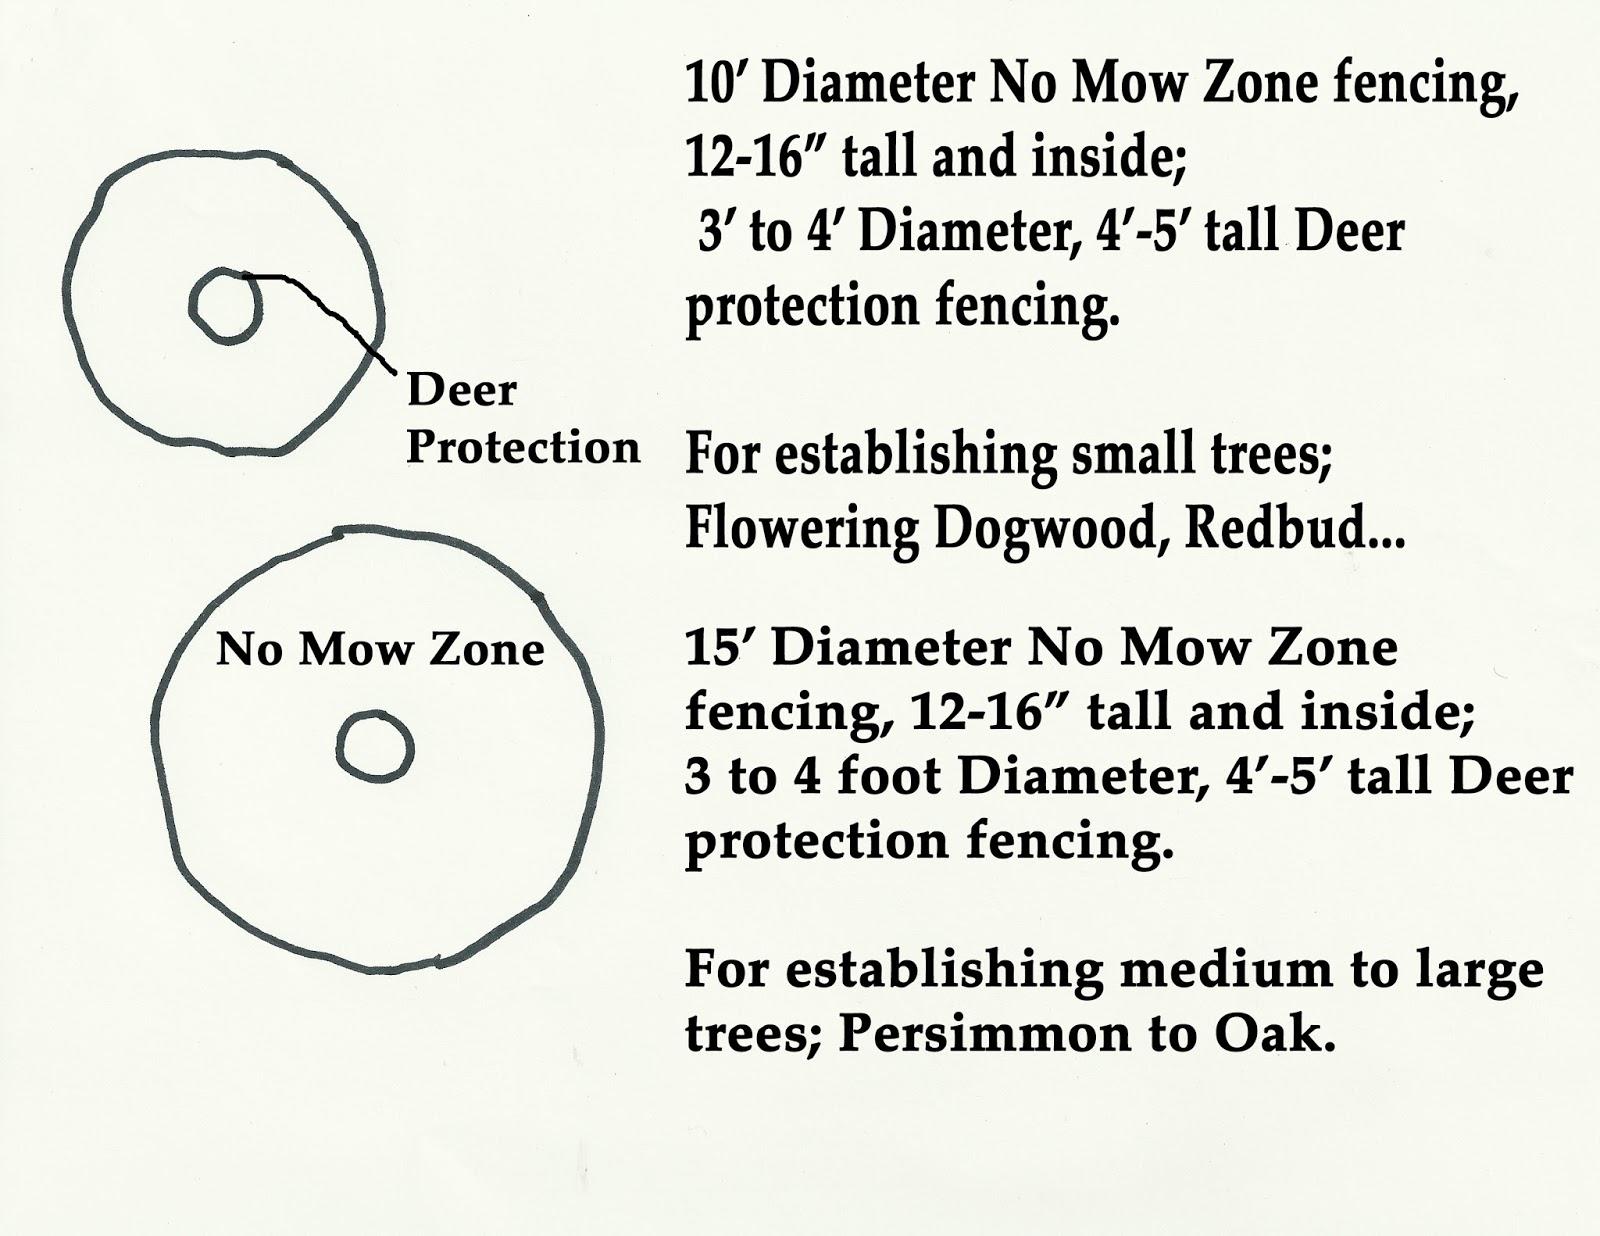 Root Zone Management Diagram.jpg